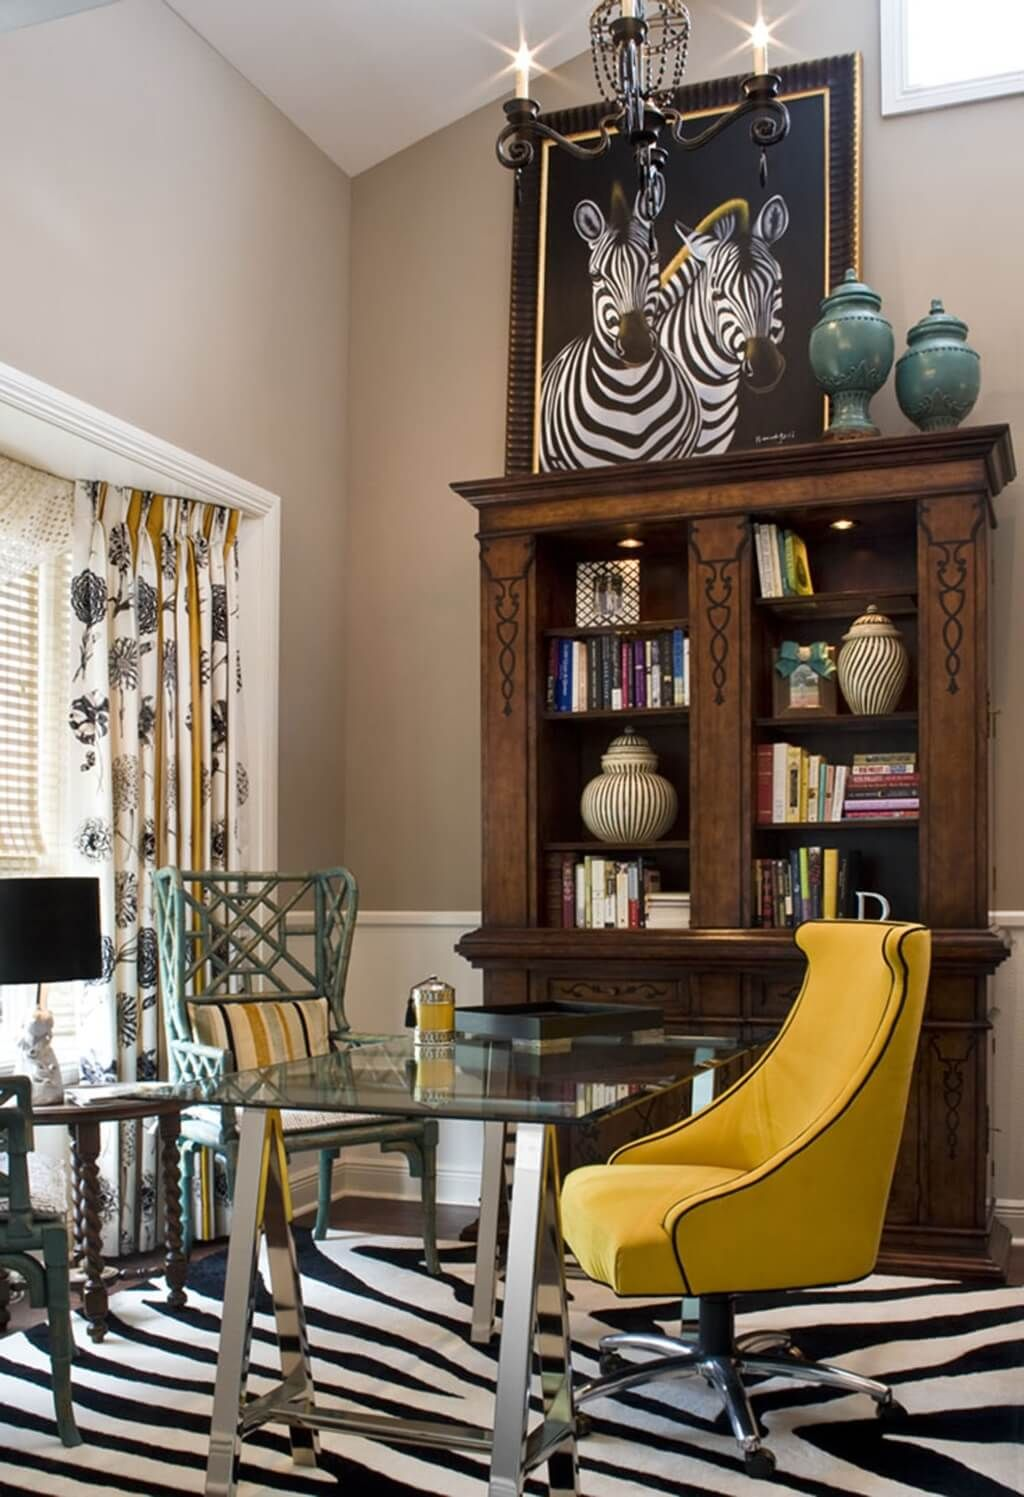 Home Decor Stores Barrie Ontario